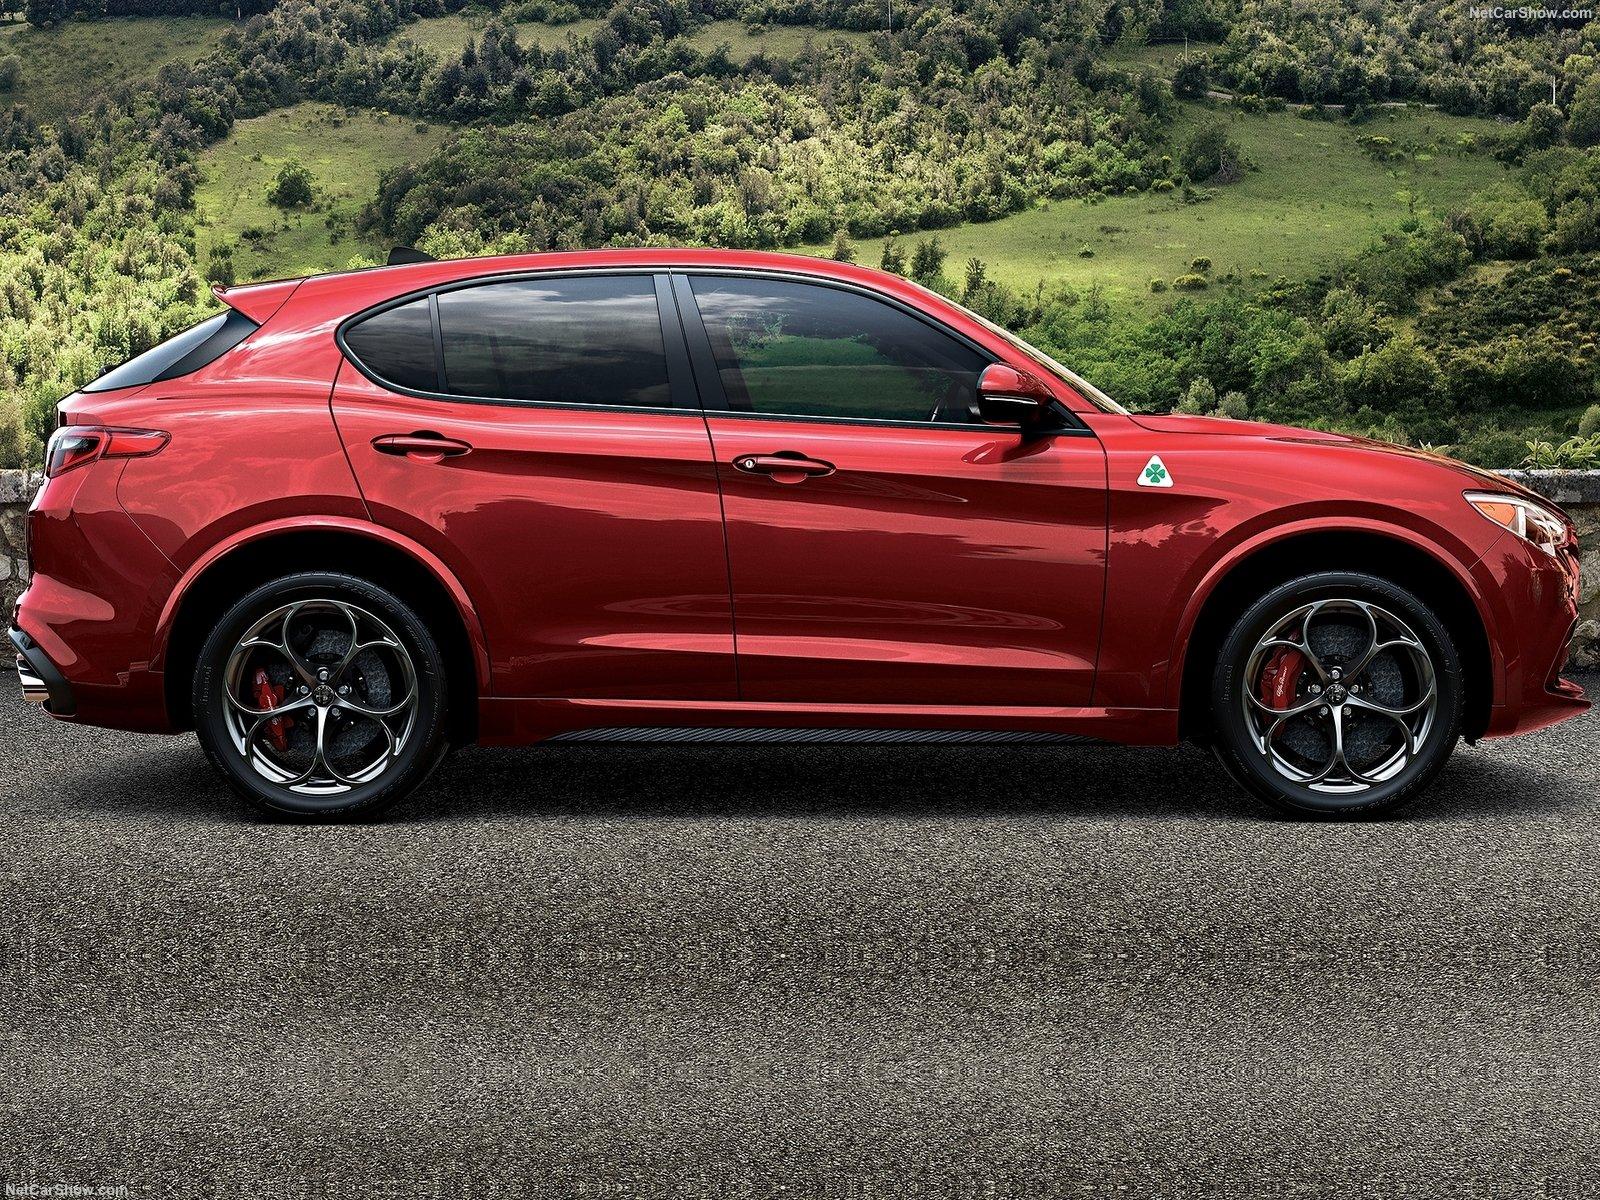 Alfa_Romeo-Stelvio_Quadrifoglio-2018-1600-04.jpg